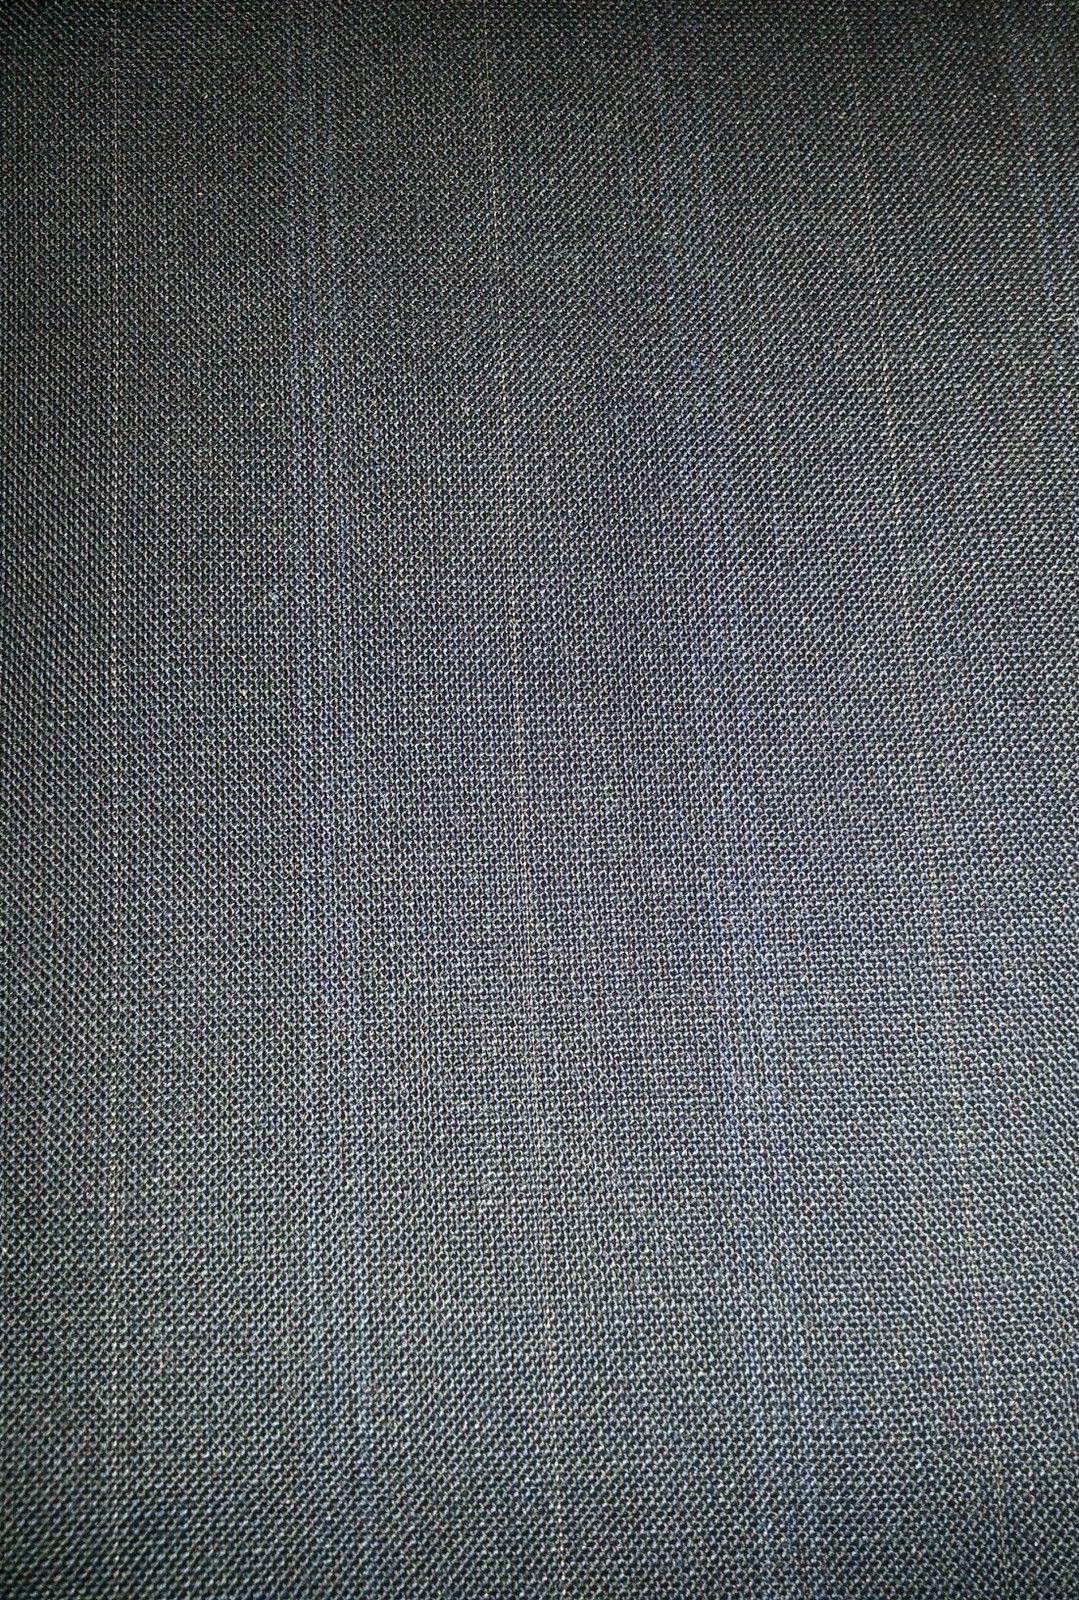 10+ YARD  BLUE GREY LIGHTWEIGHT ITALIAN WOOL SUPER 120'S MSRP $1300